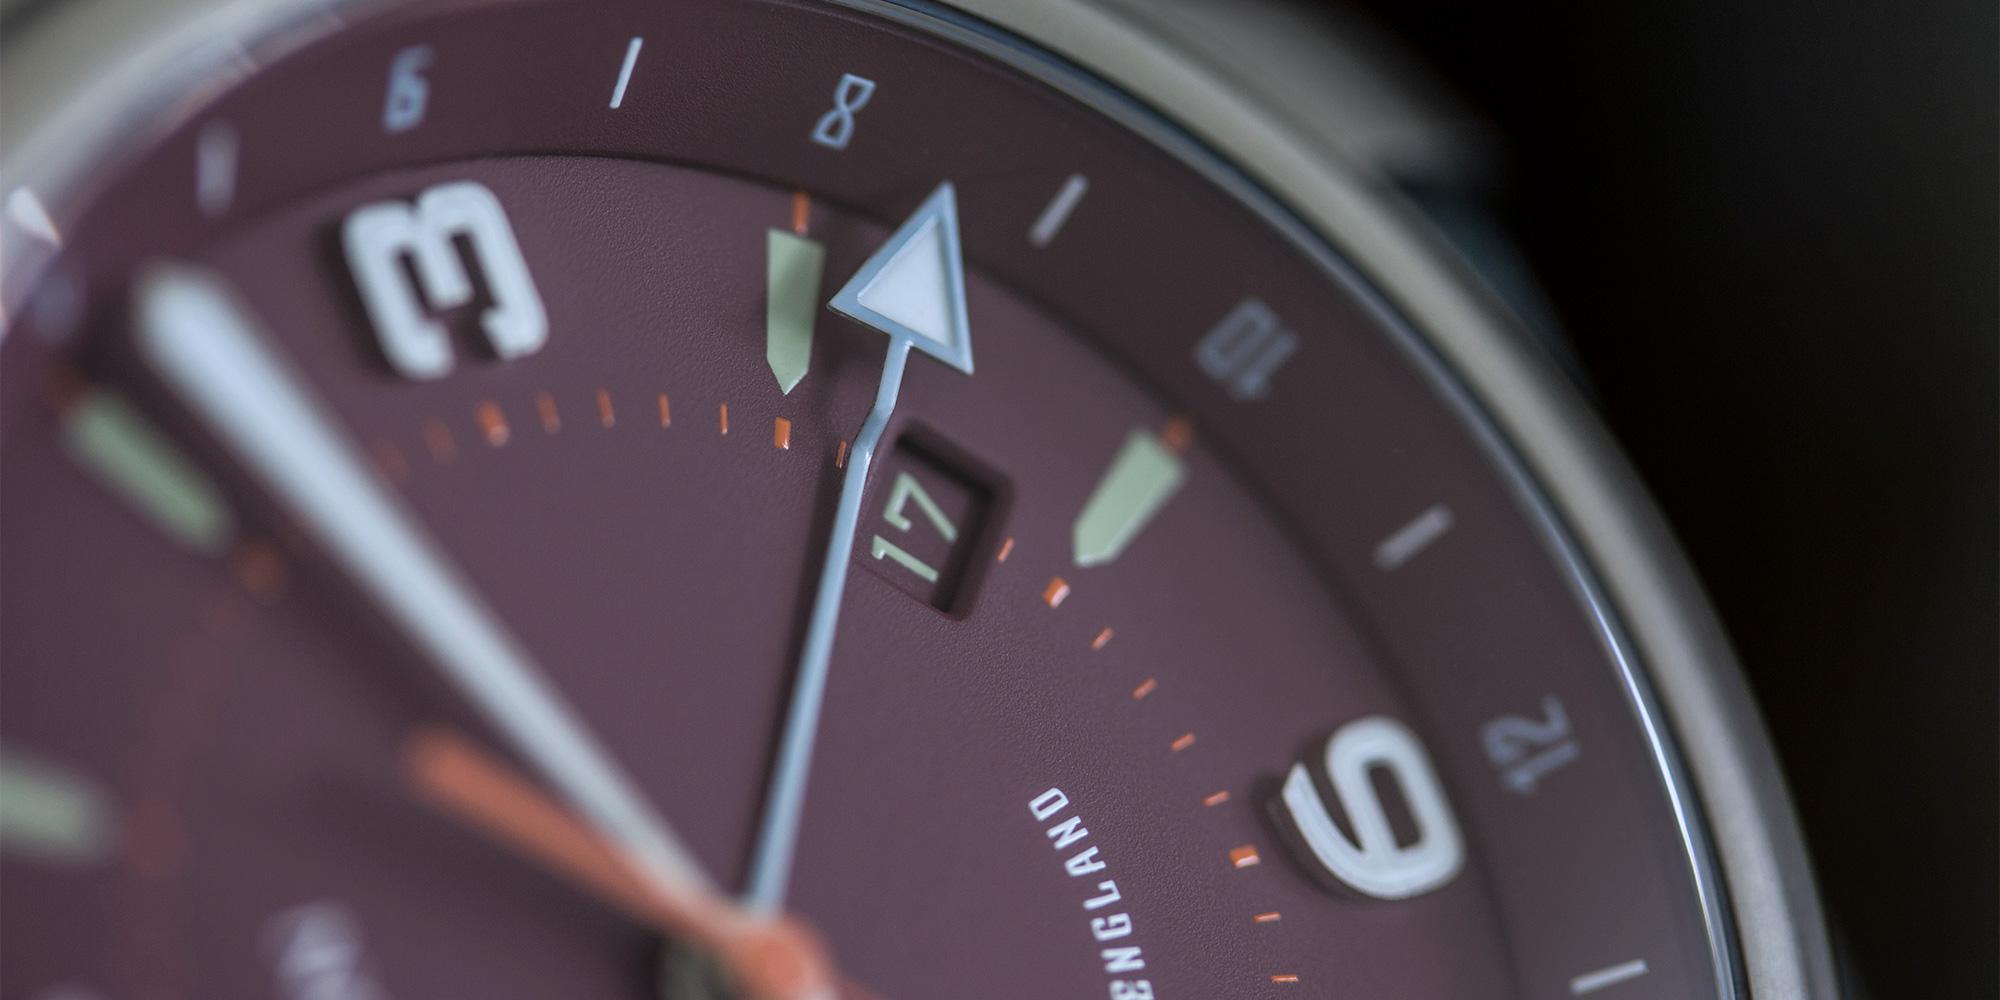 pinion-tt-maroon-titanium-gmt-watch-detail